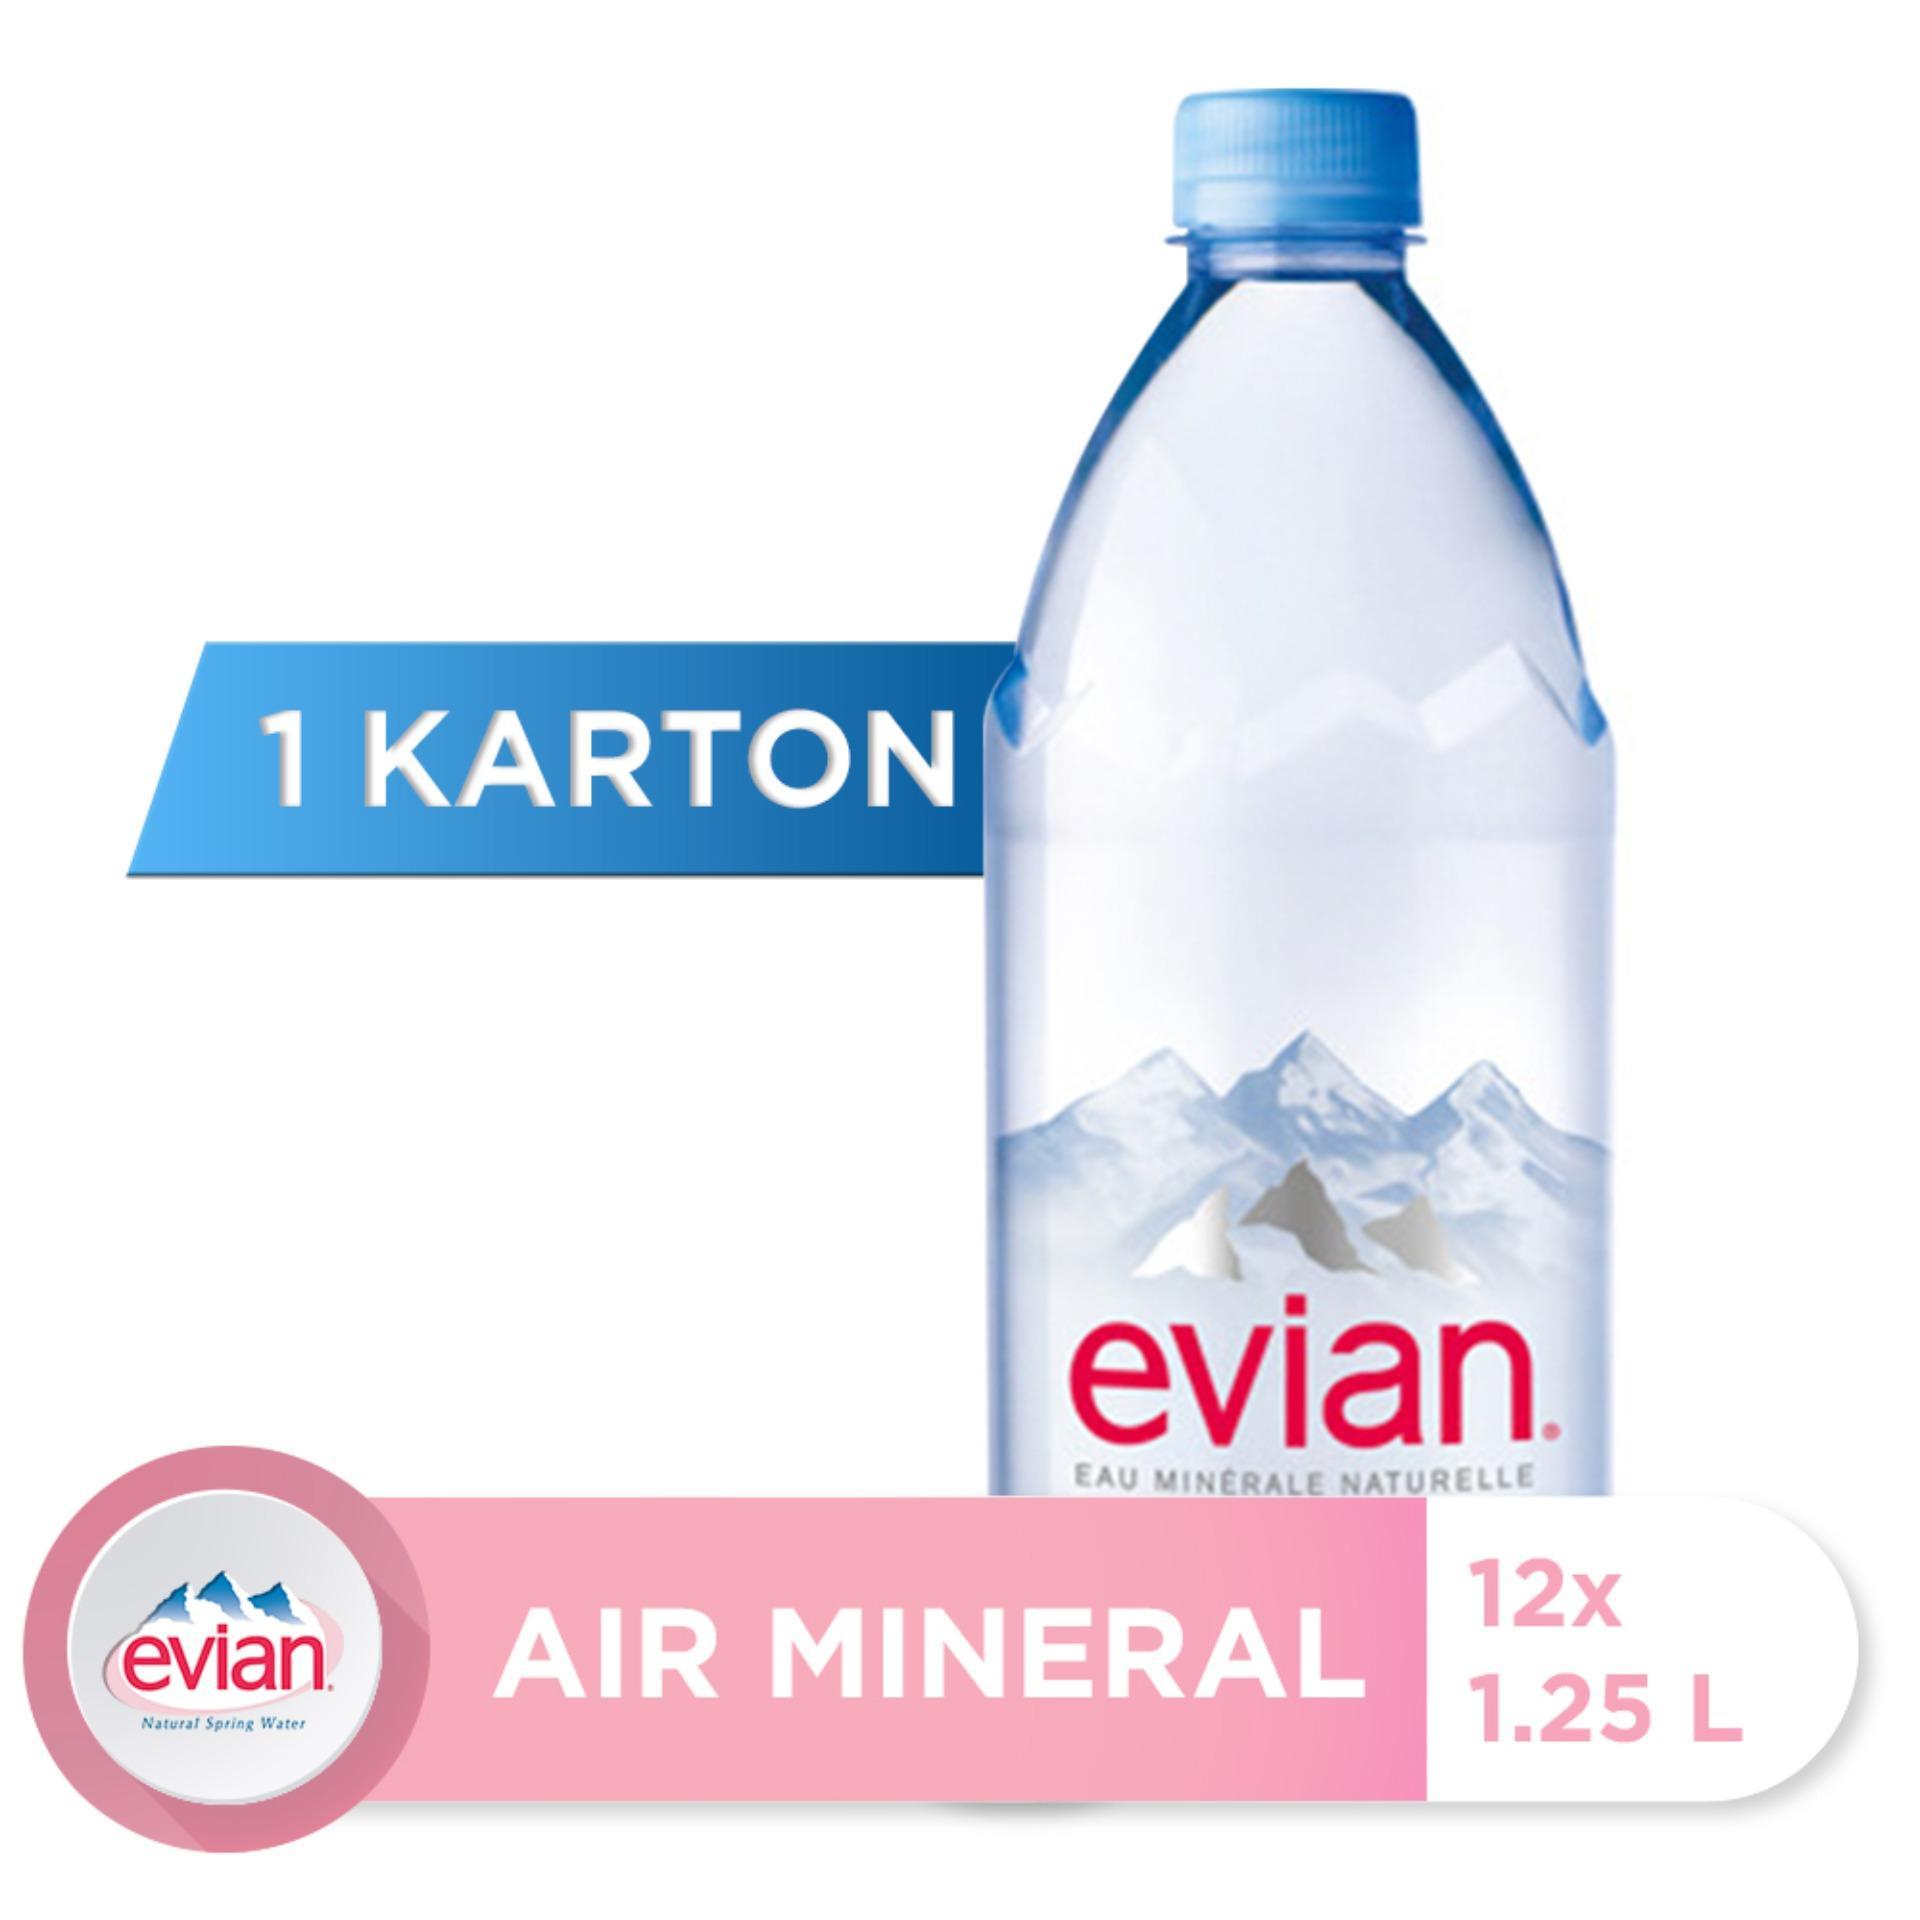 Jual Produk Facial Spray Evian Terlengkap 300ml Air Murni